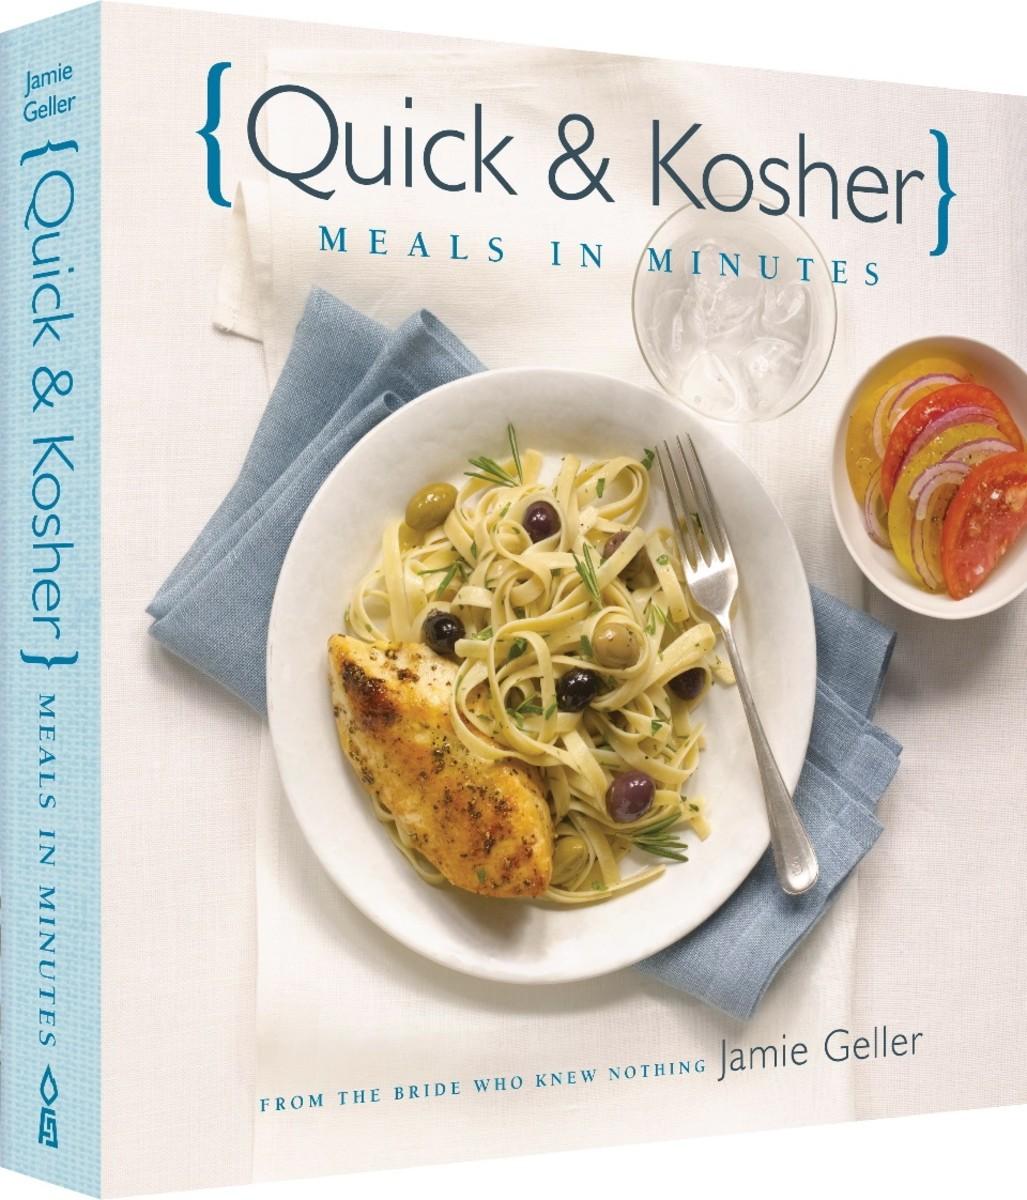 Quick & Kosher: Meals in Minutes